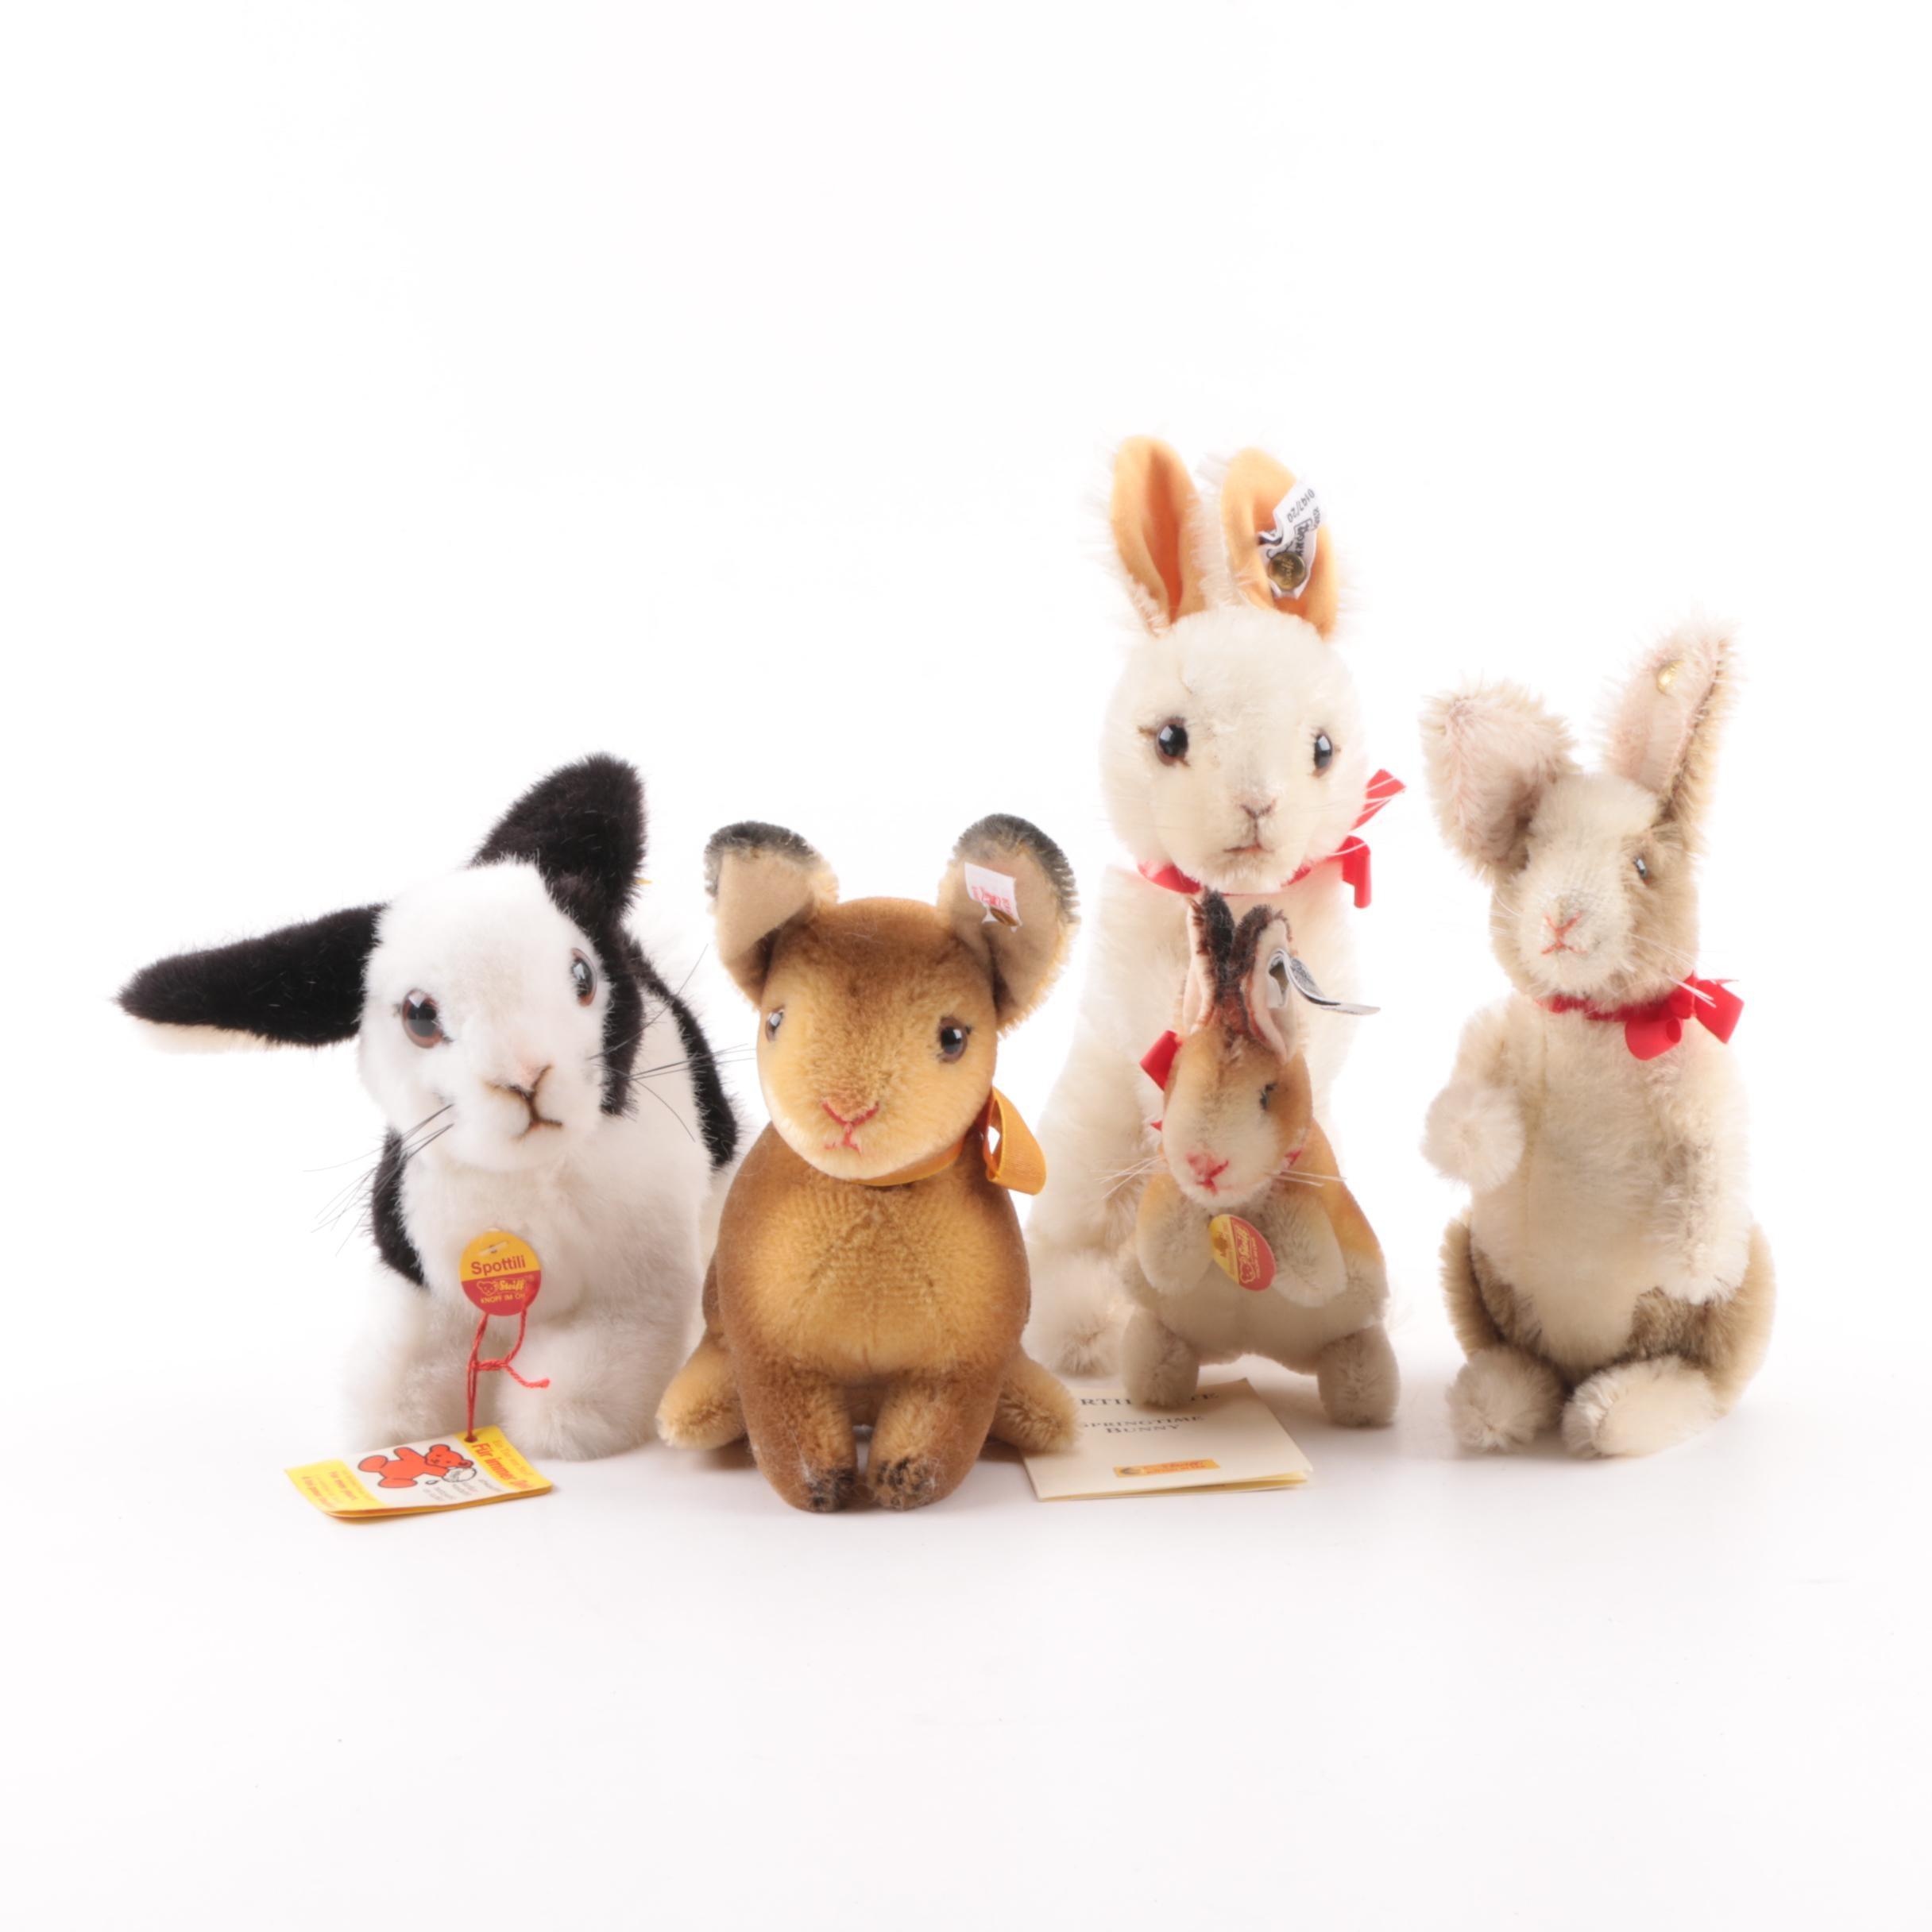 "1980-90s Steiff Plush Mohair Rabbits including ""Spottili"""